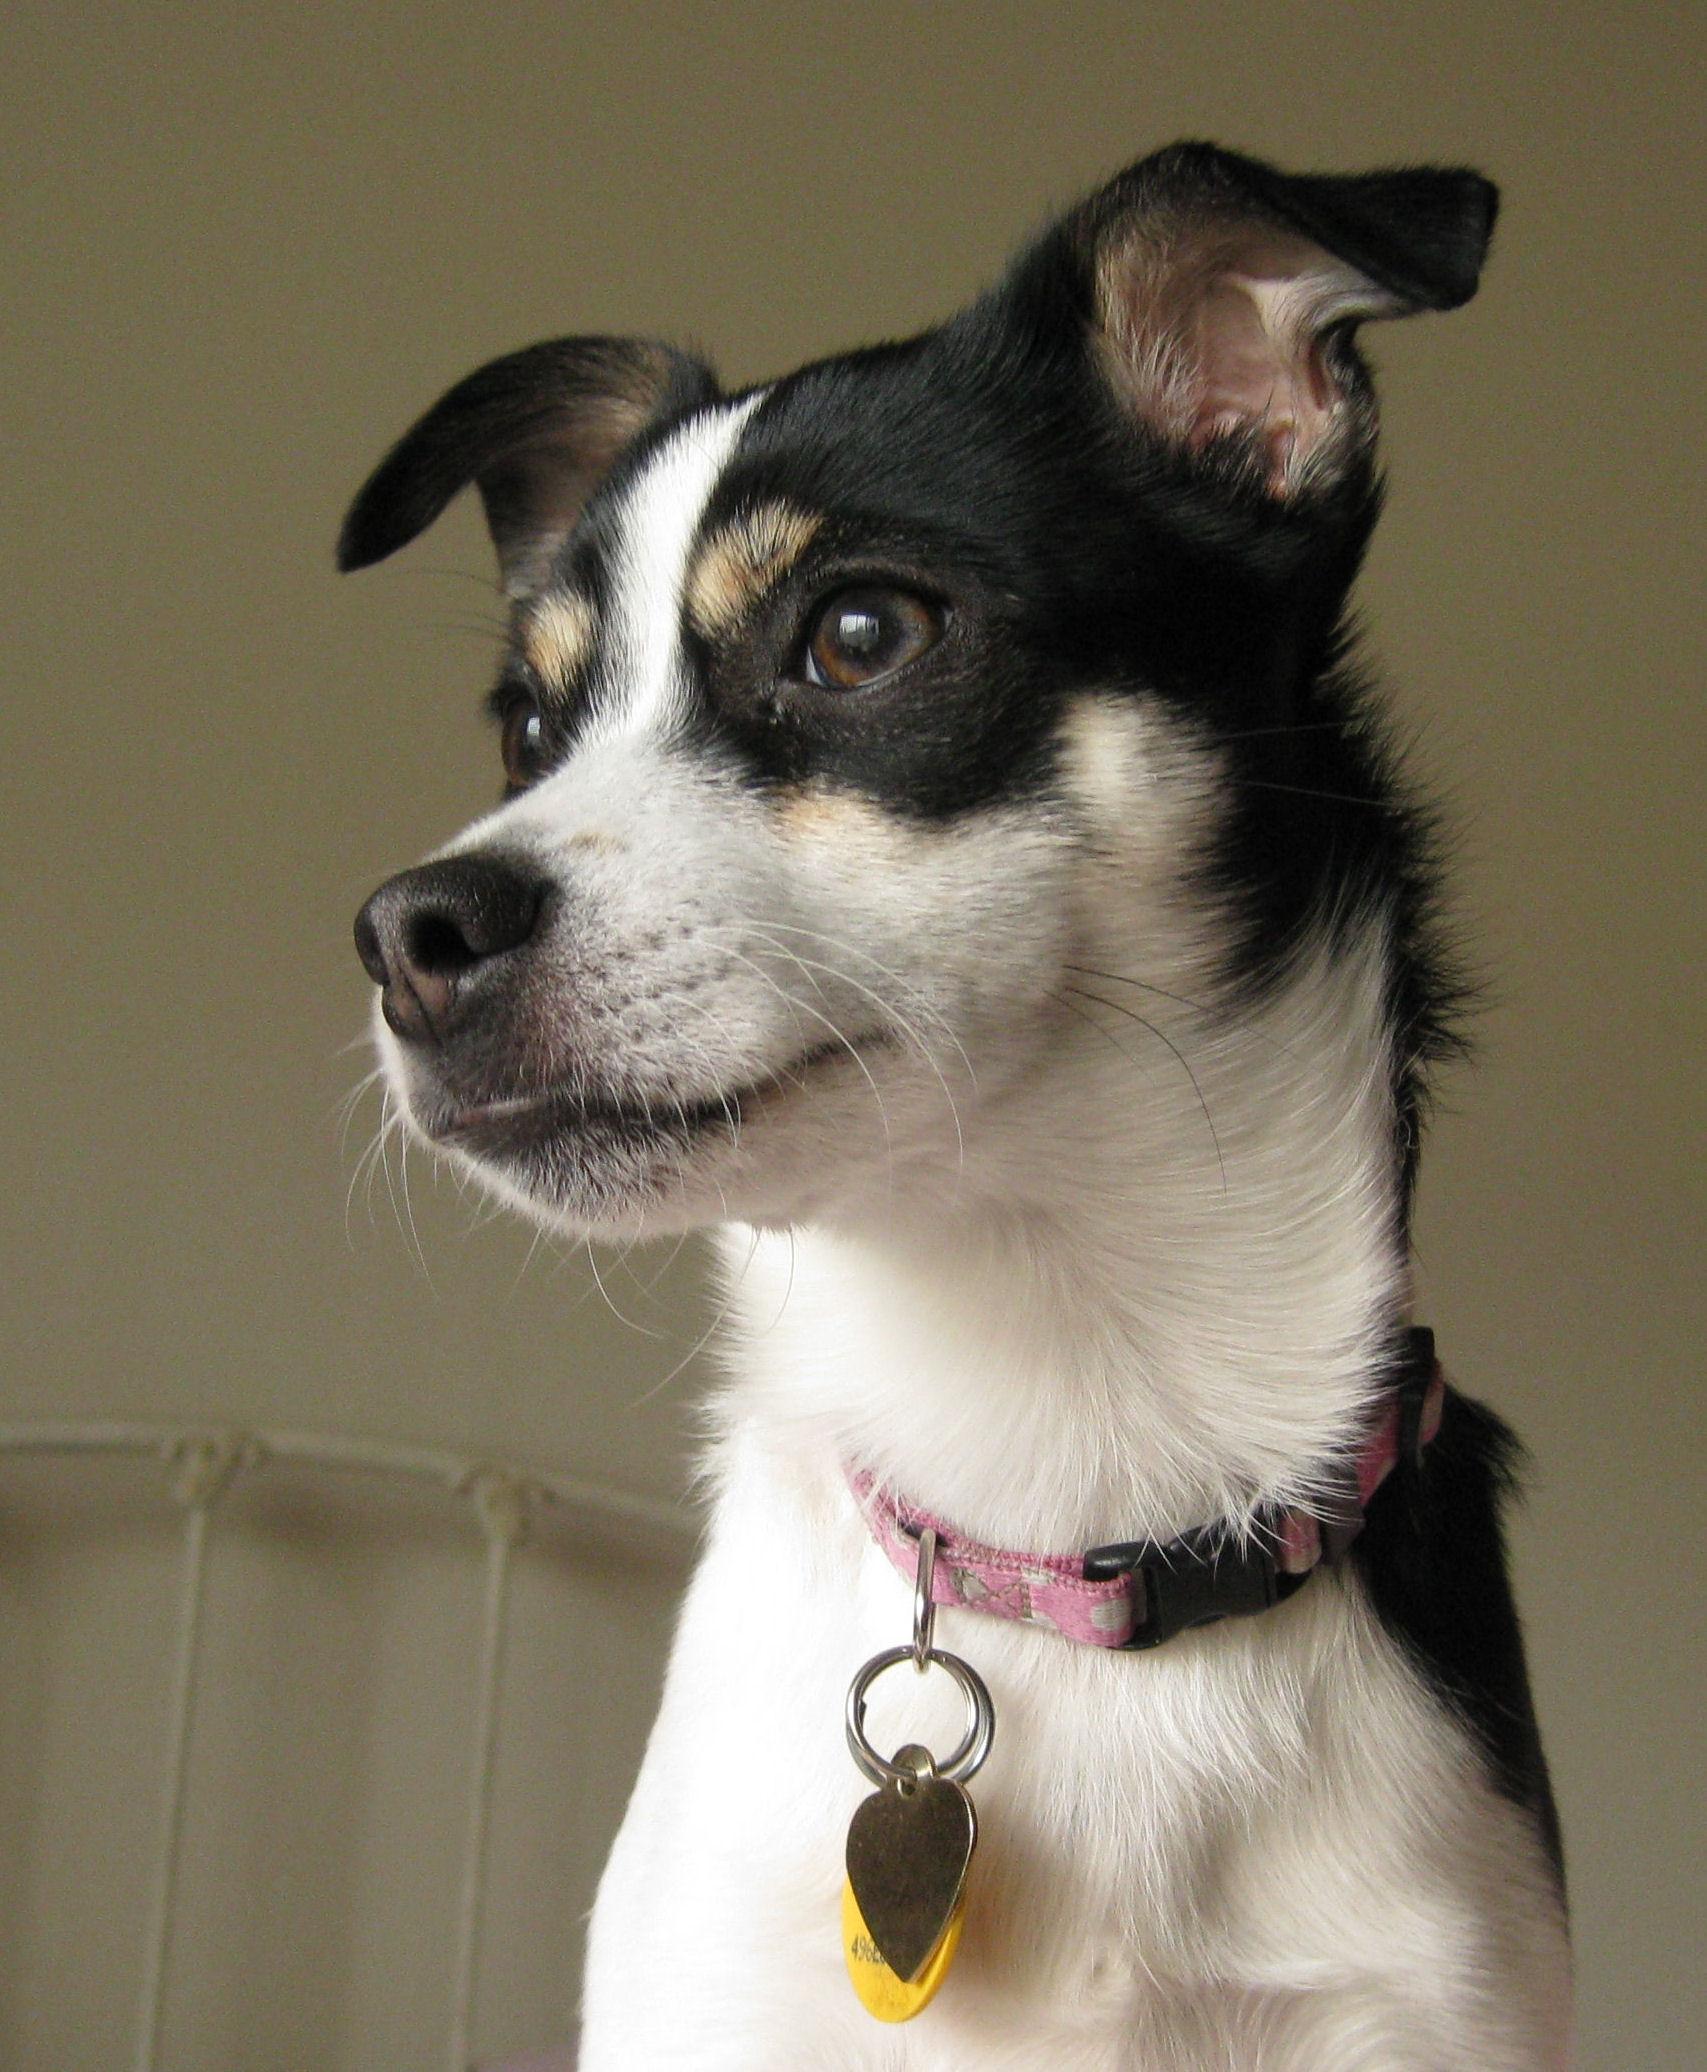 Rat Terrier dog face wallpaper